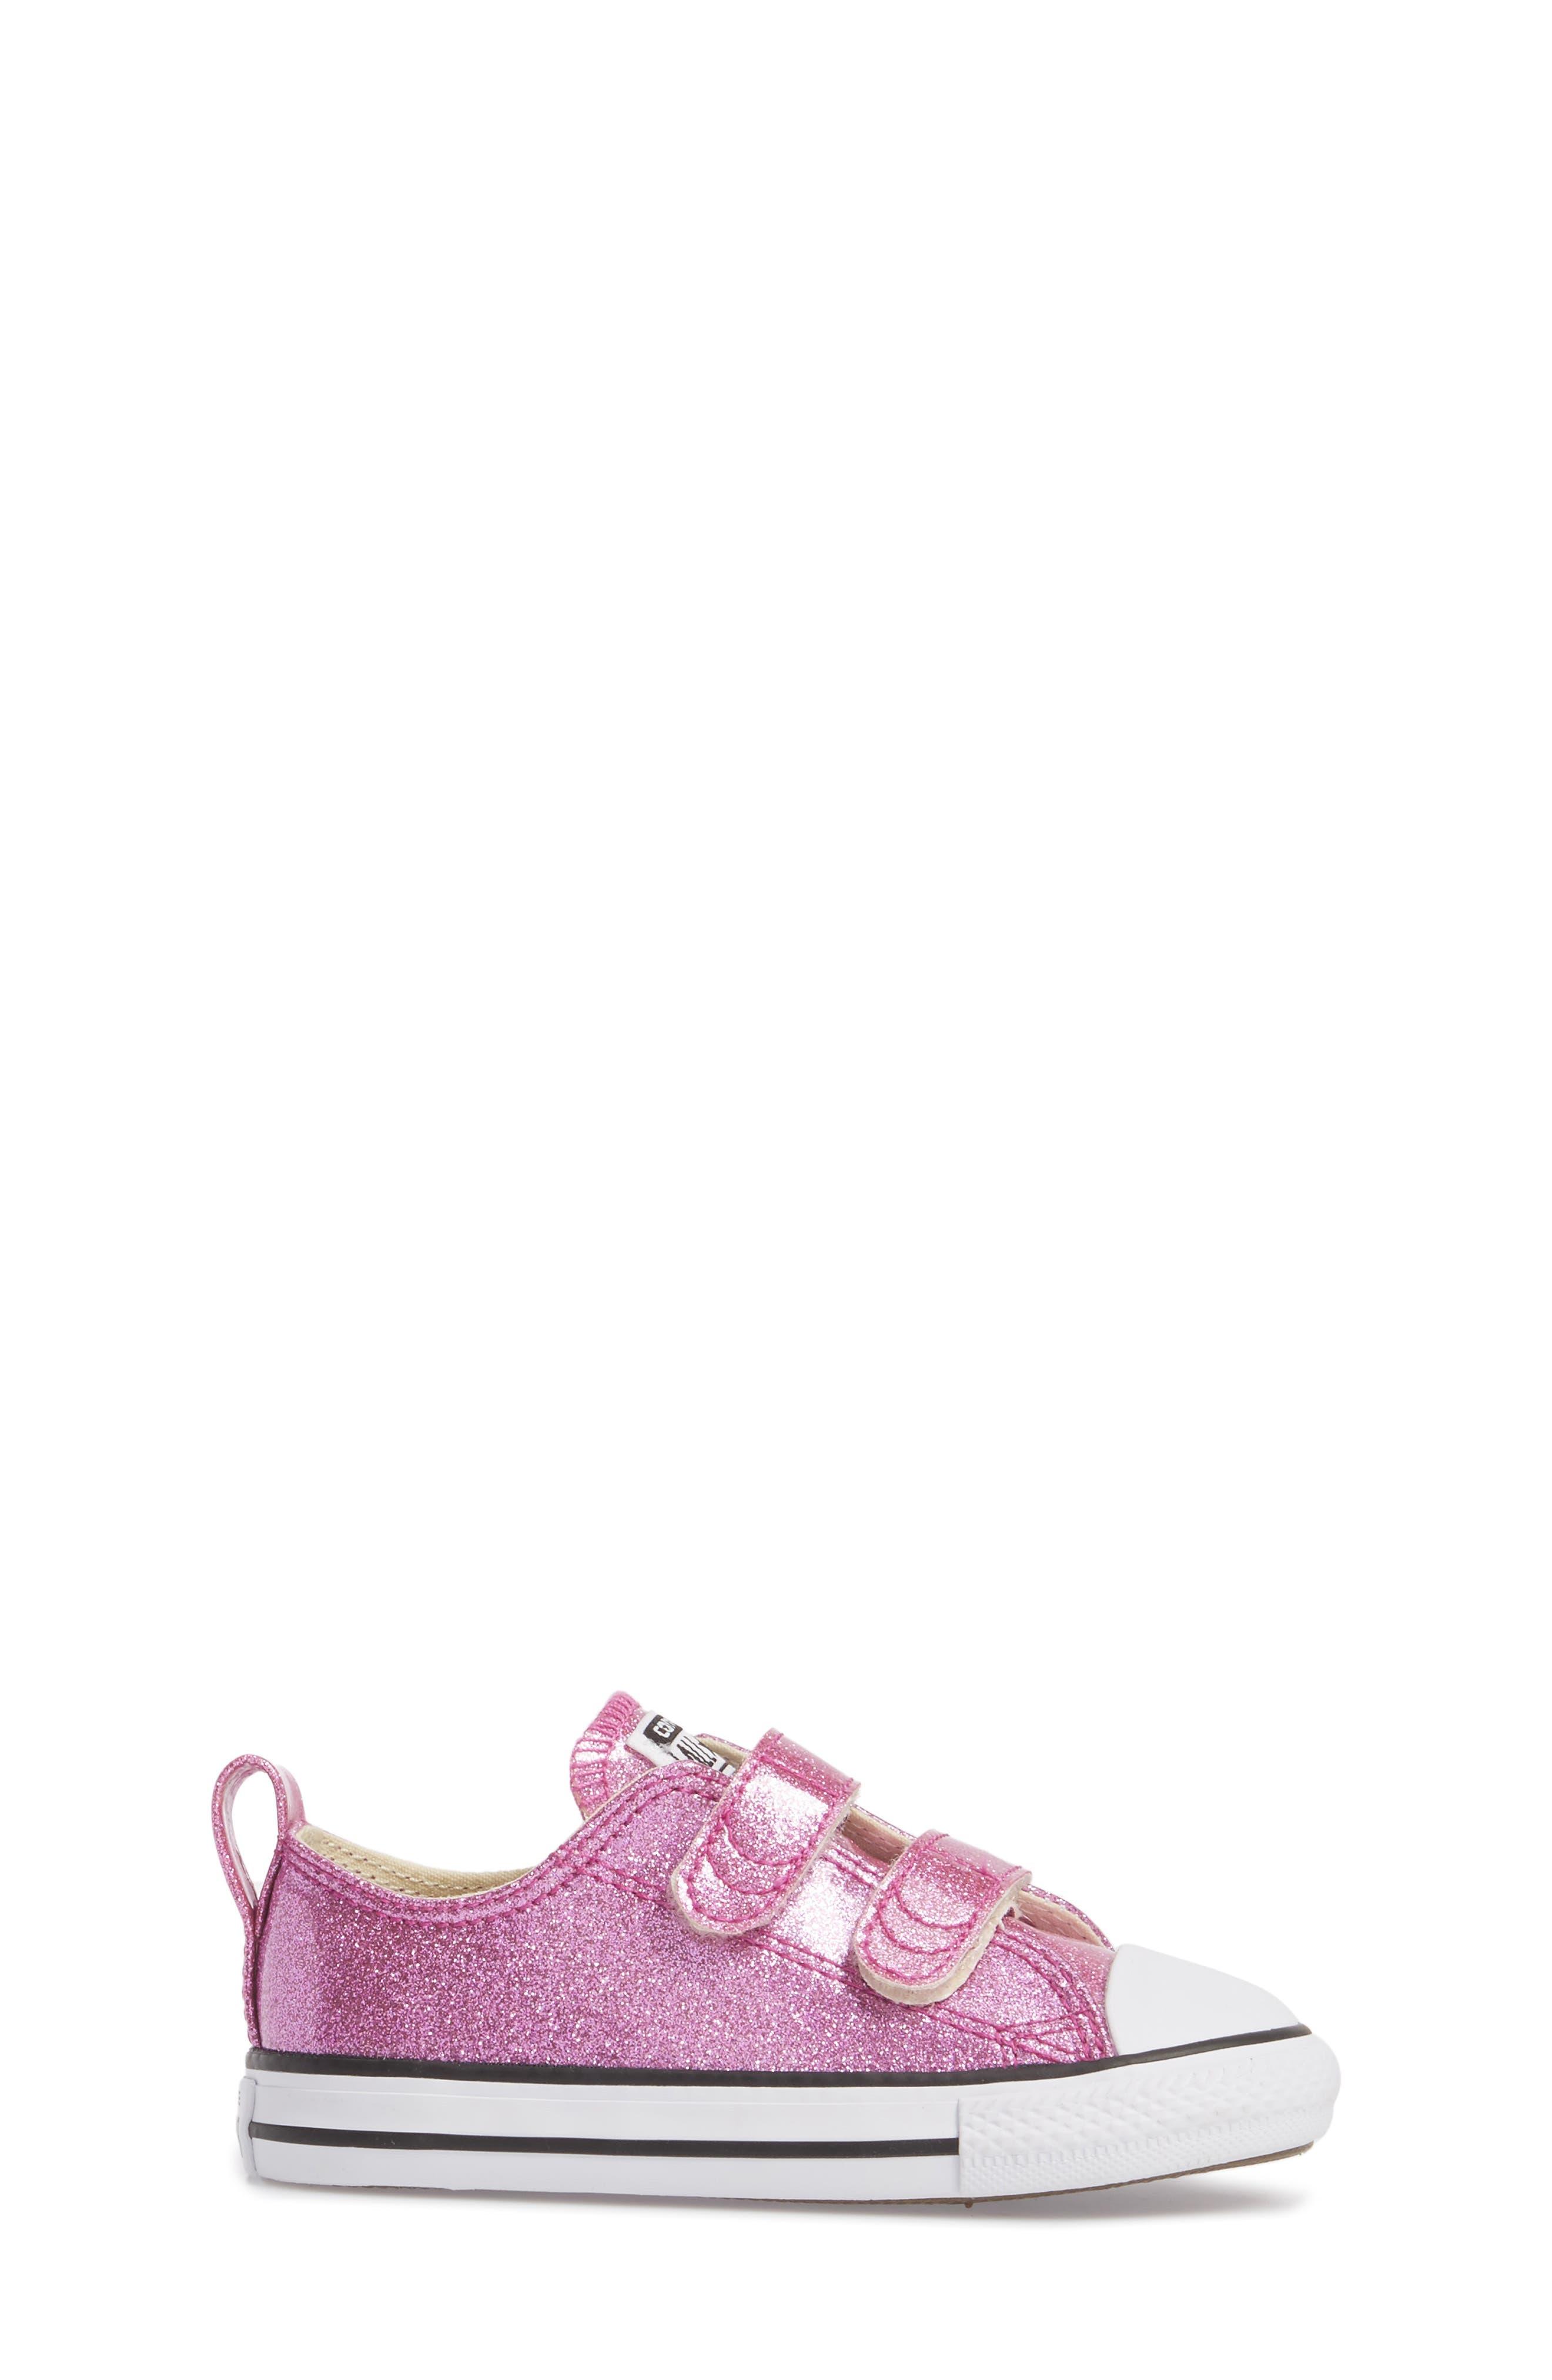 All Star<sup>®</sup> Seasonal Glitter Sneaker,                             Alternate thumbnail 3, color,                             500